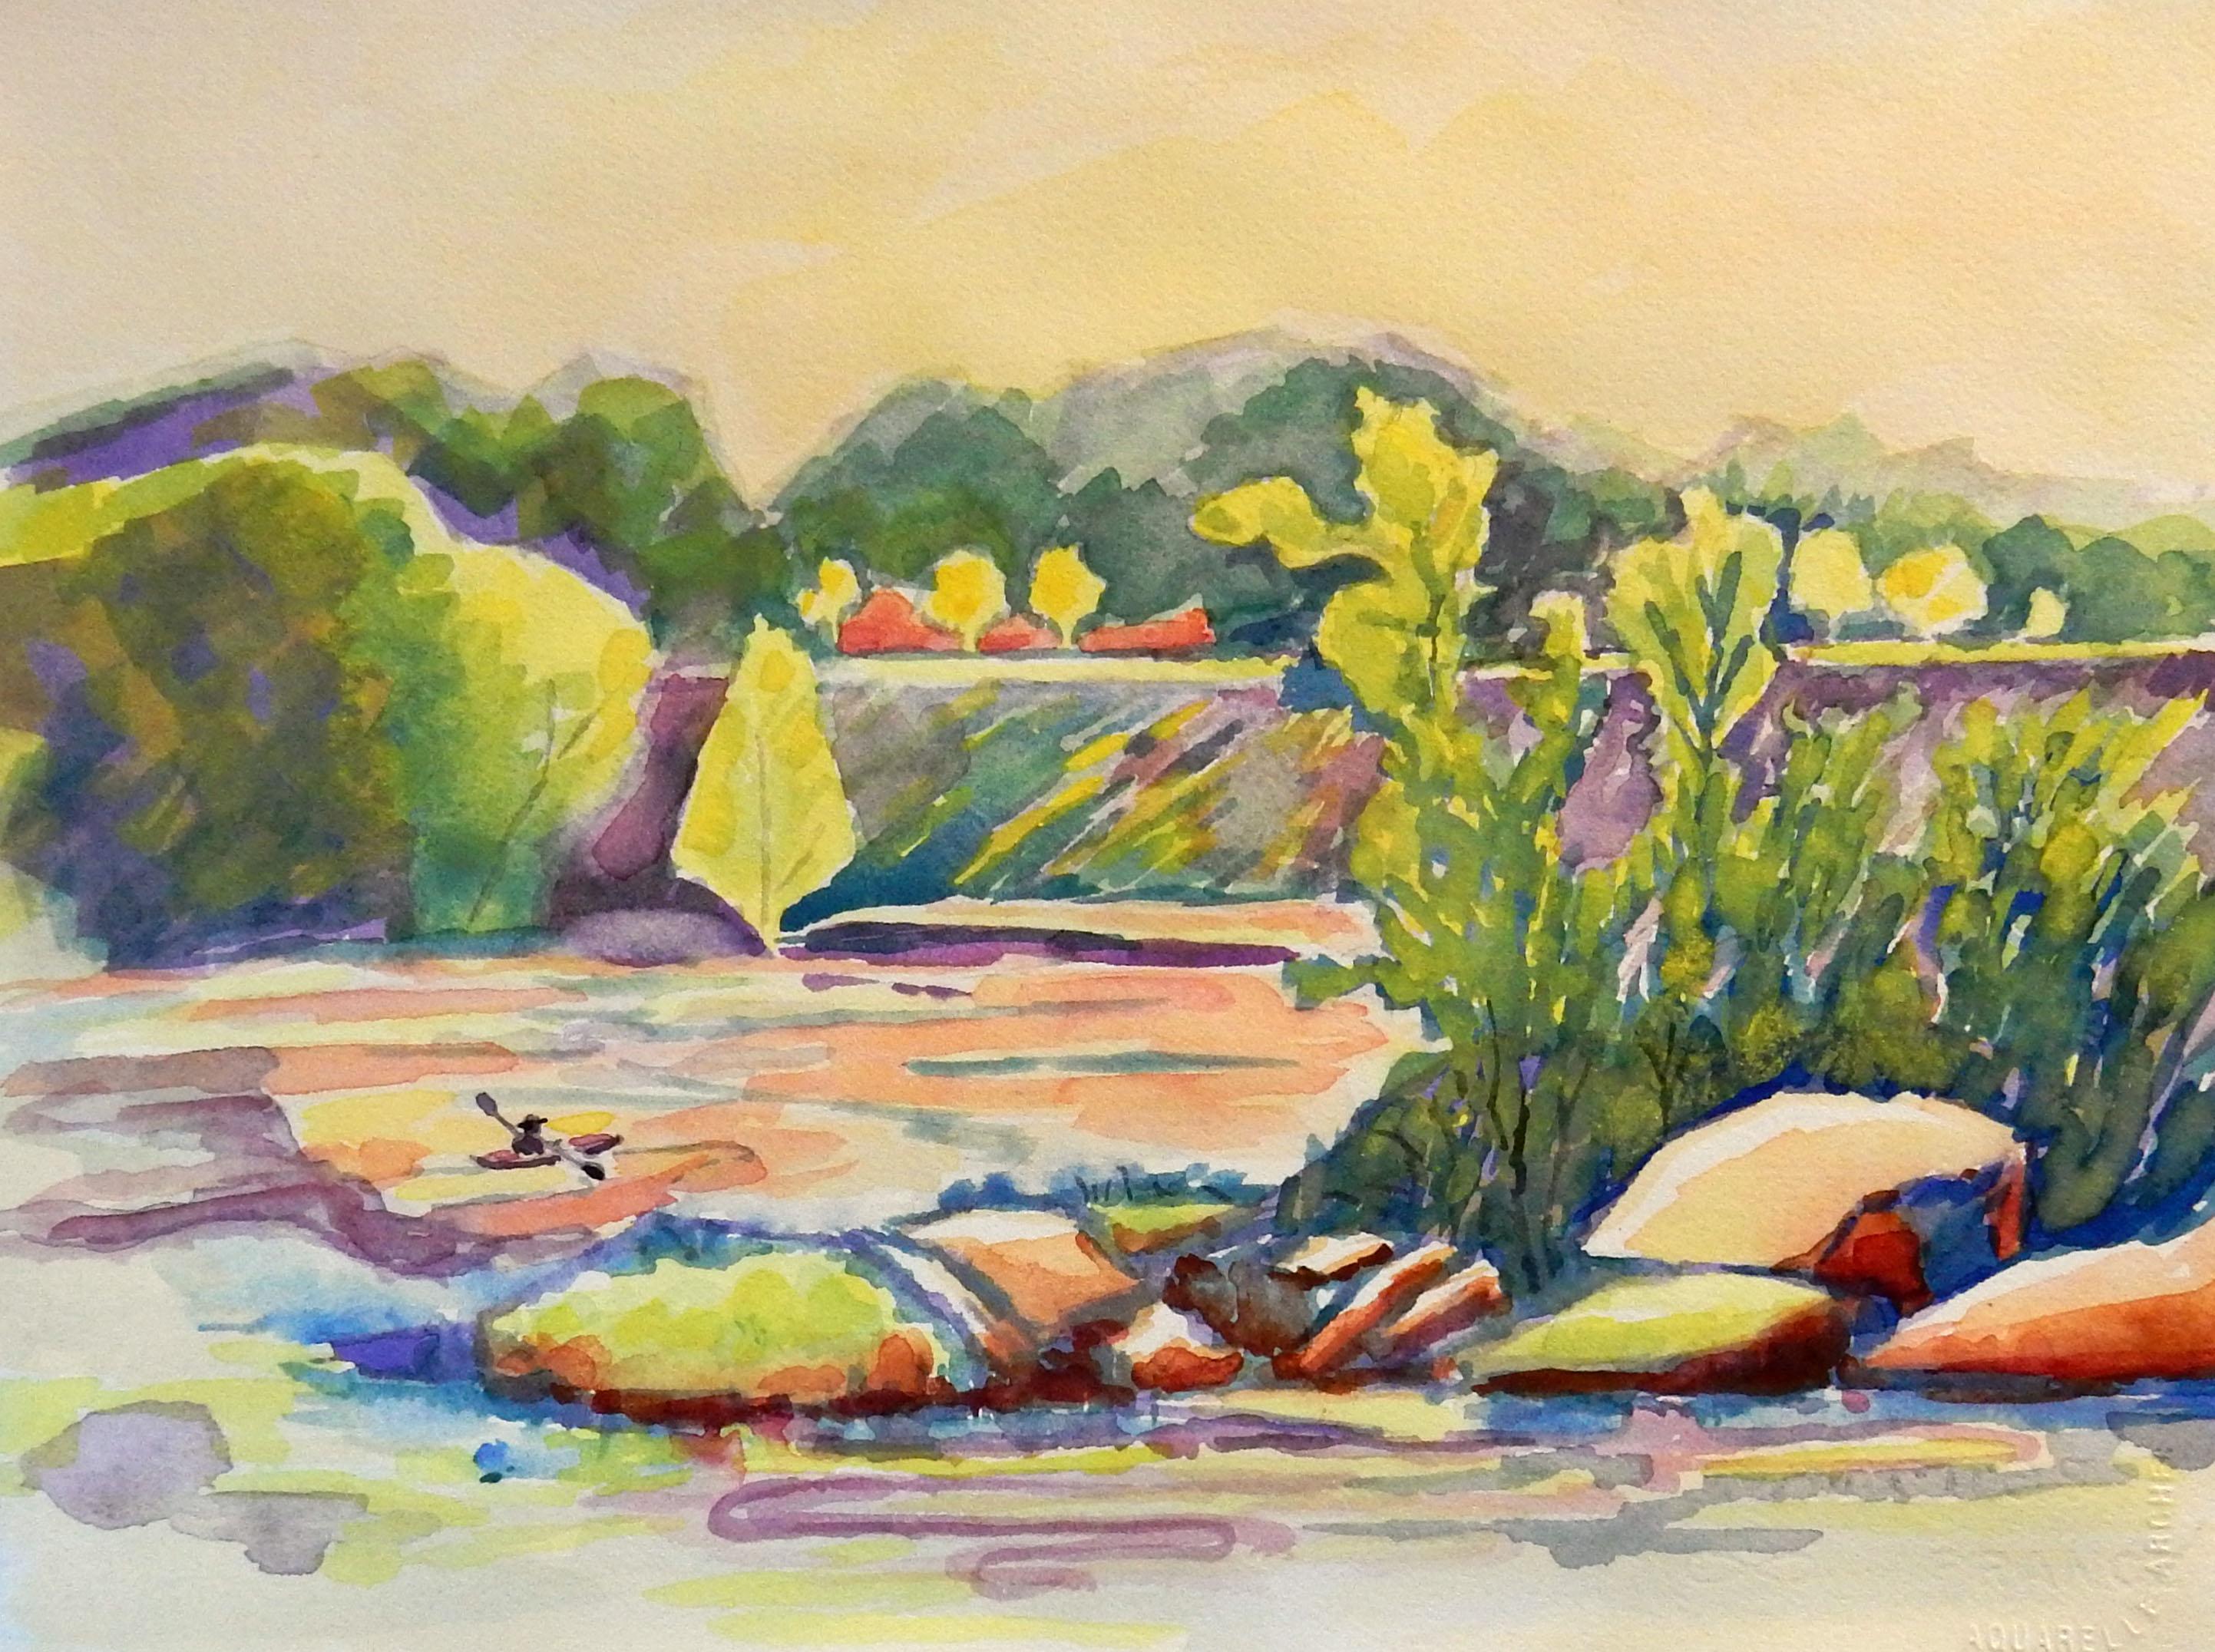 Downstream Paddler, Nancy Williams